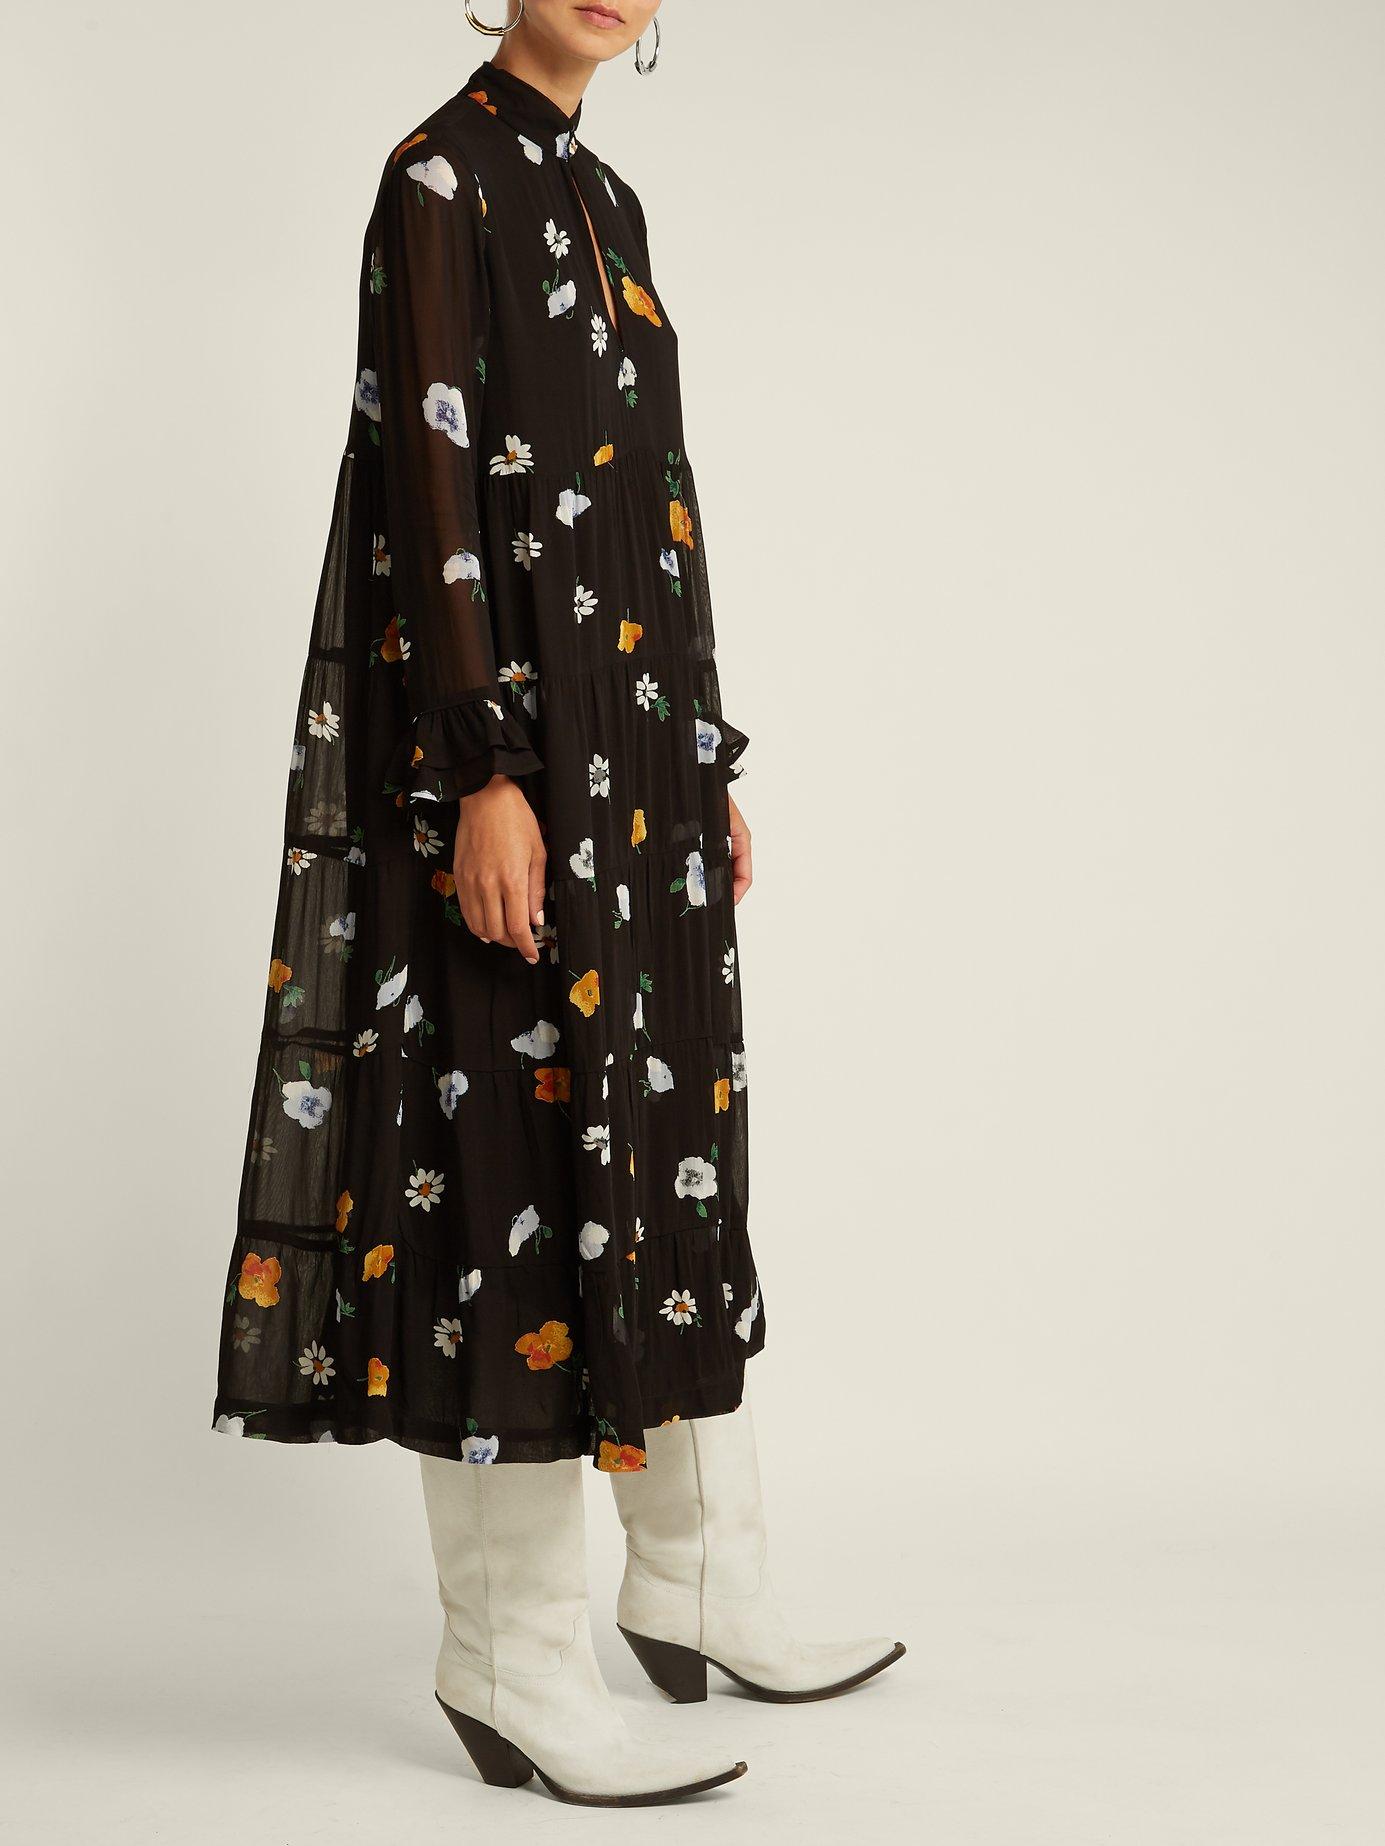 Dainty floral-print crepe-georgette dress by Ganni